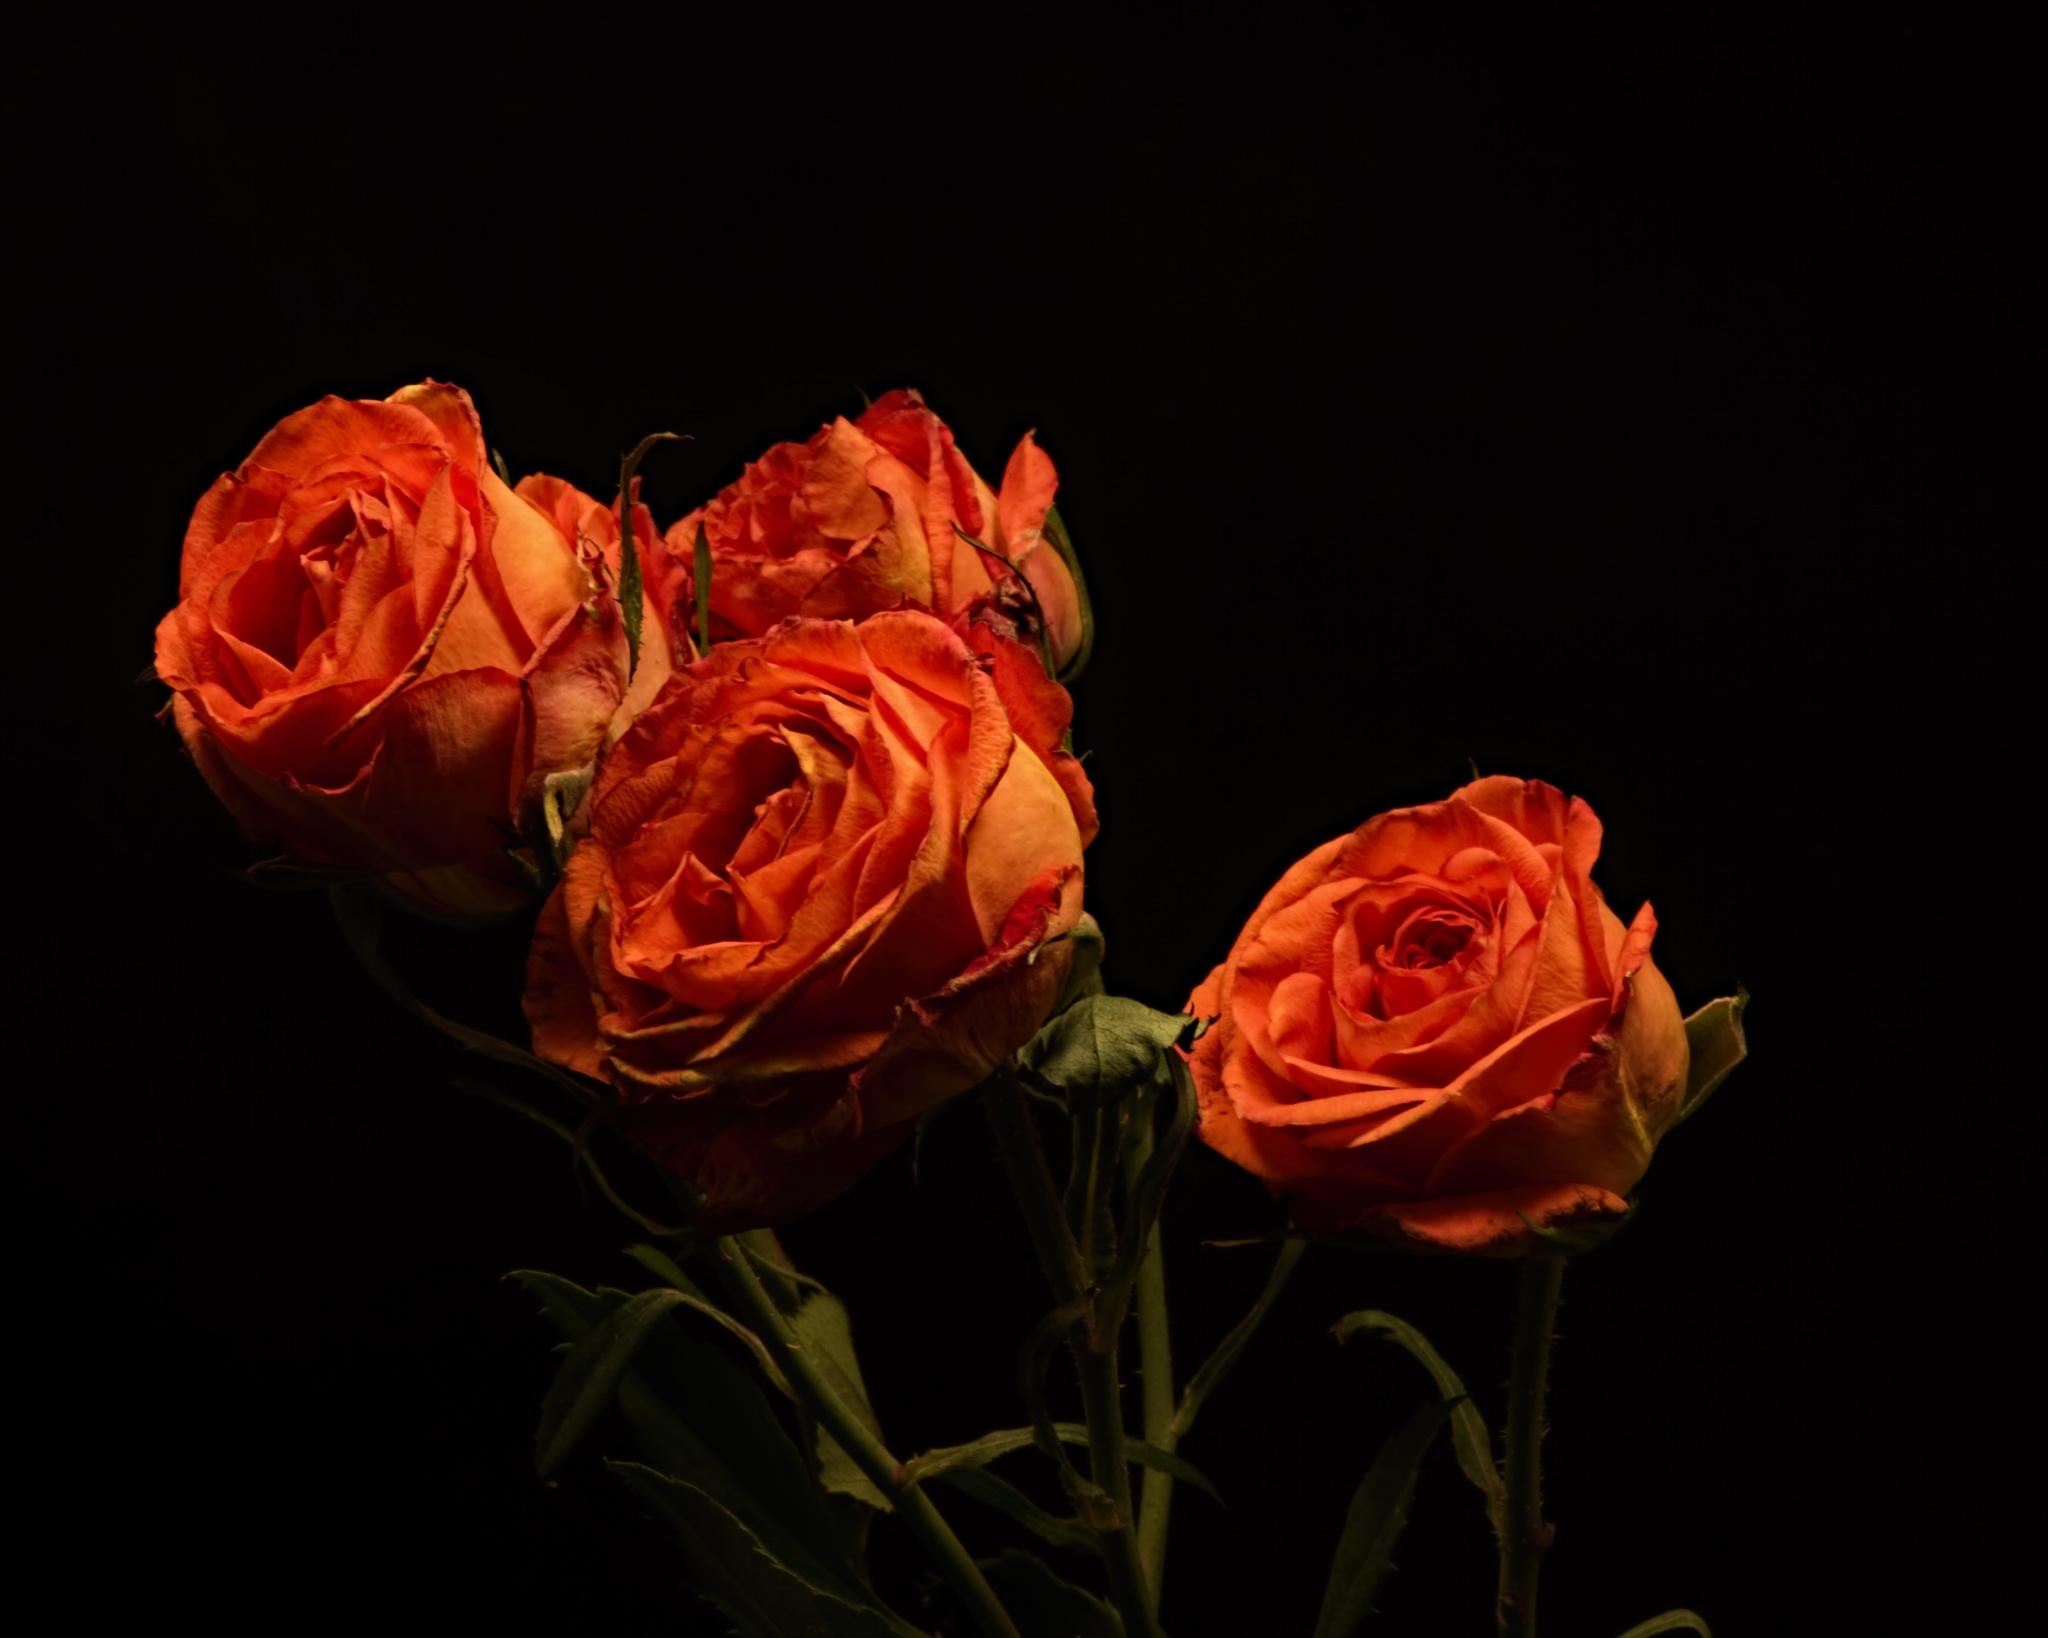 Orange Spray Roses 0102 by ThomasJerger